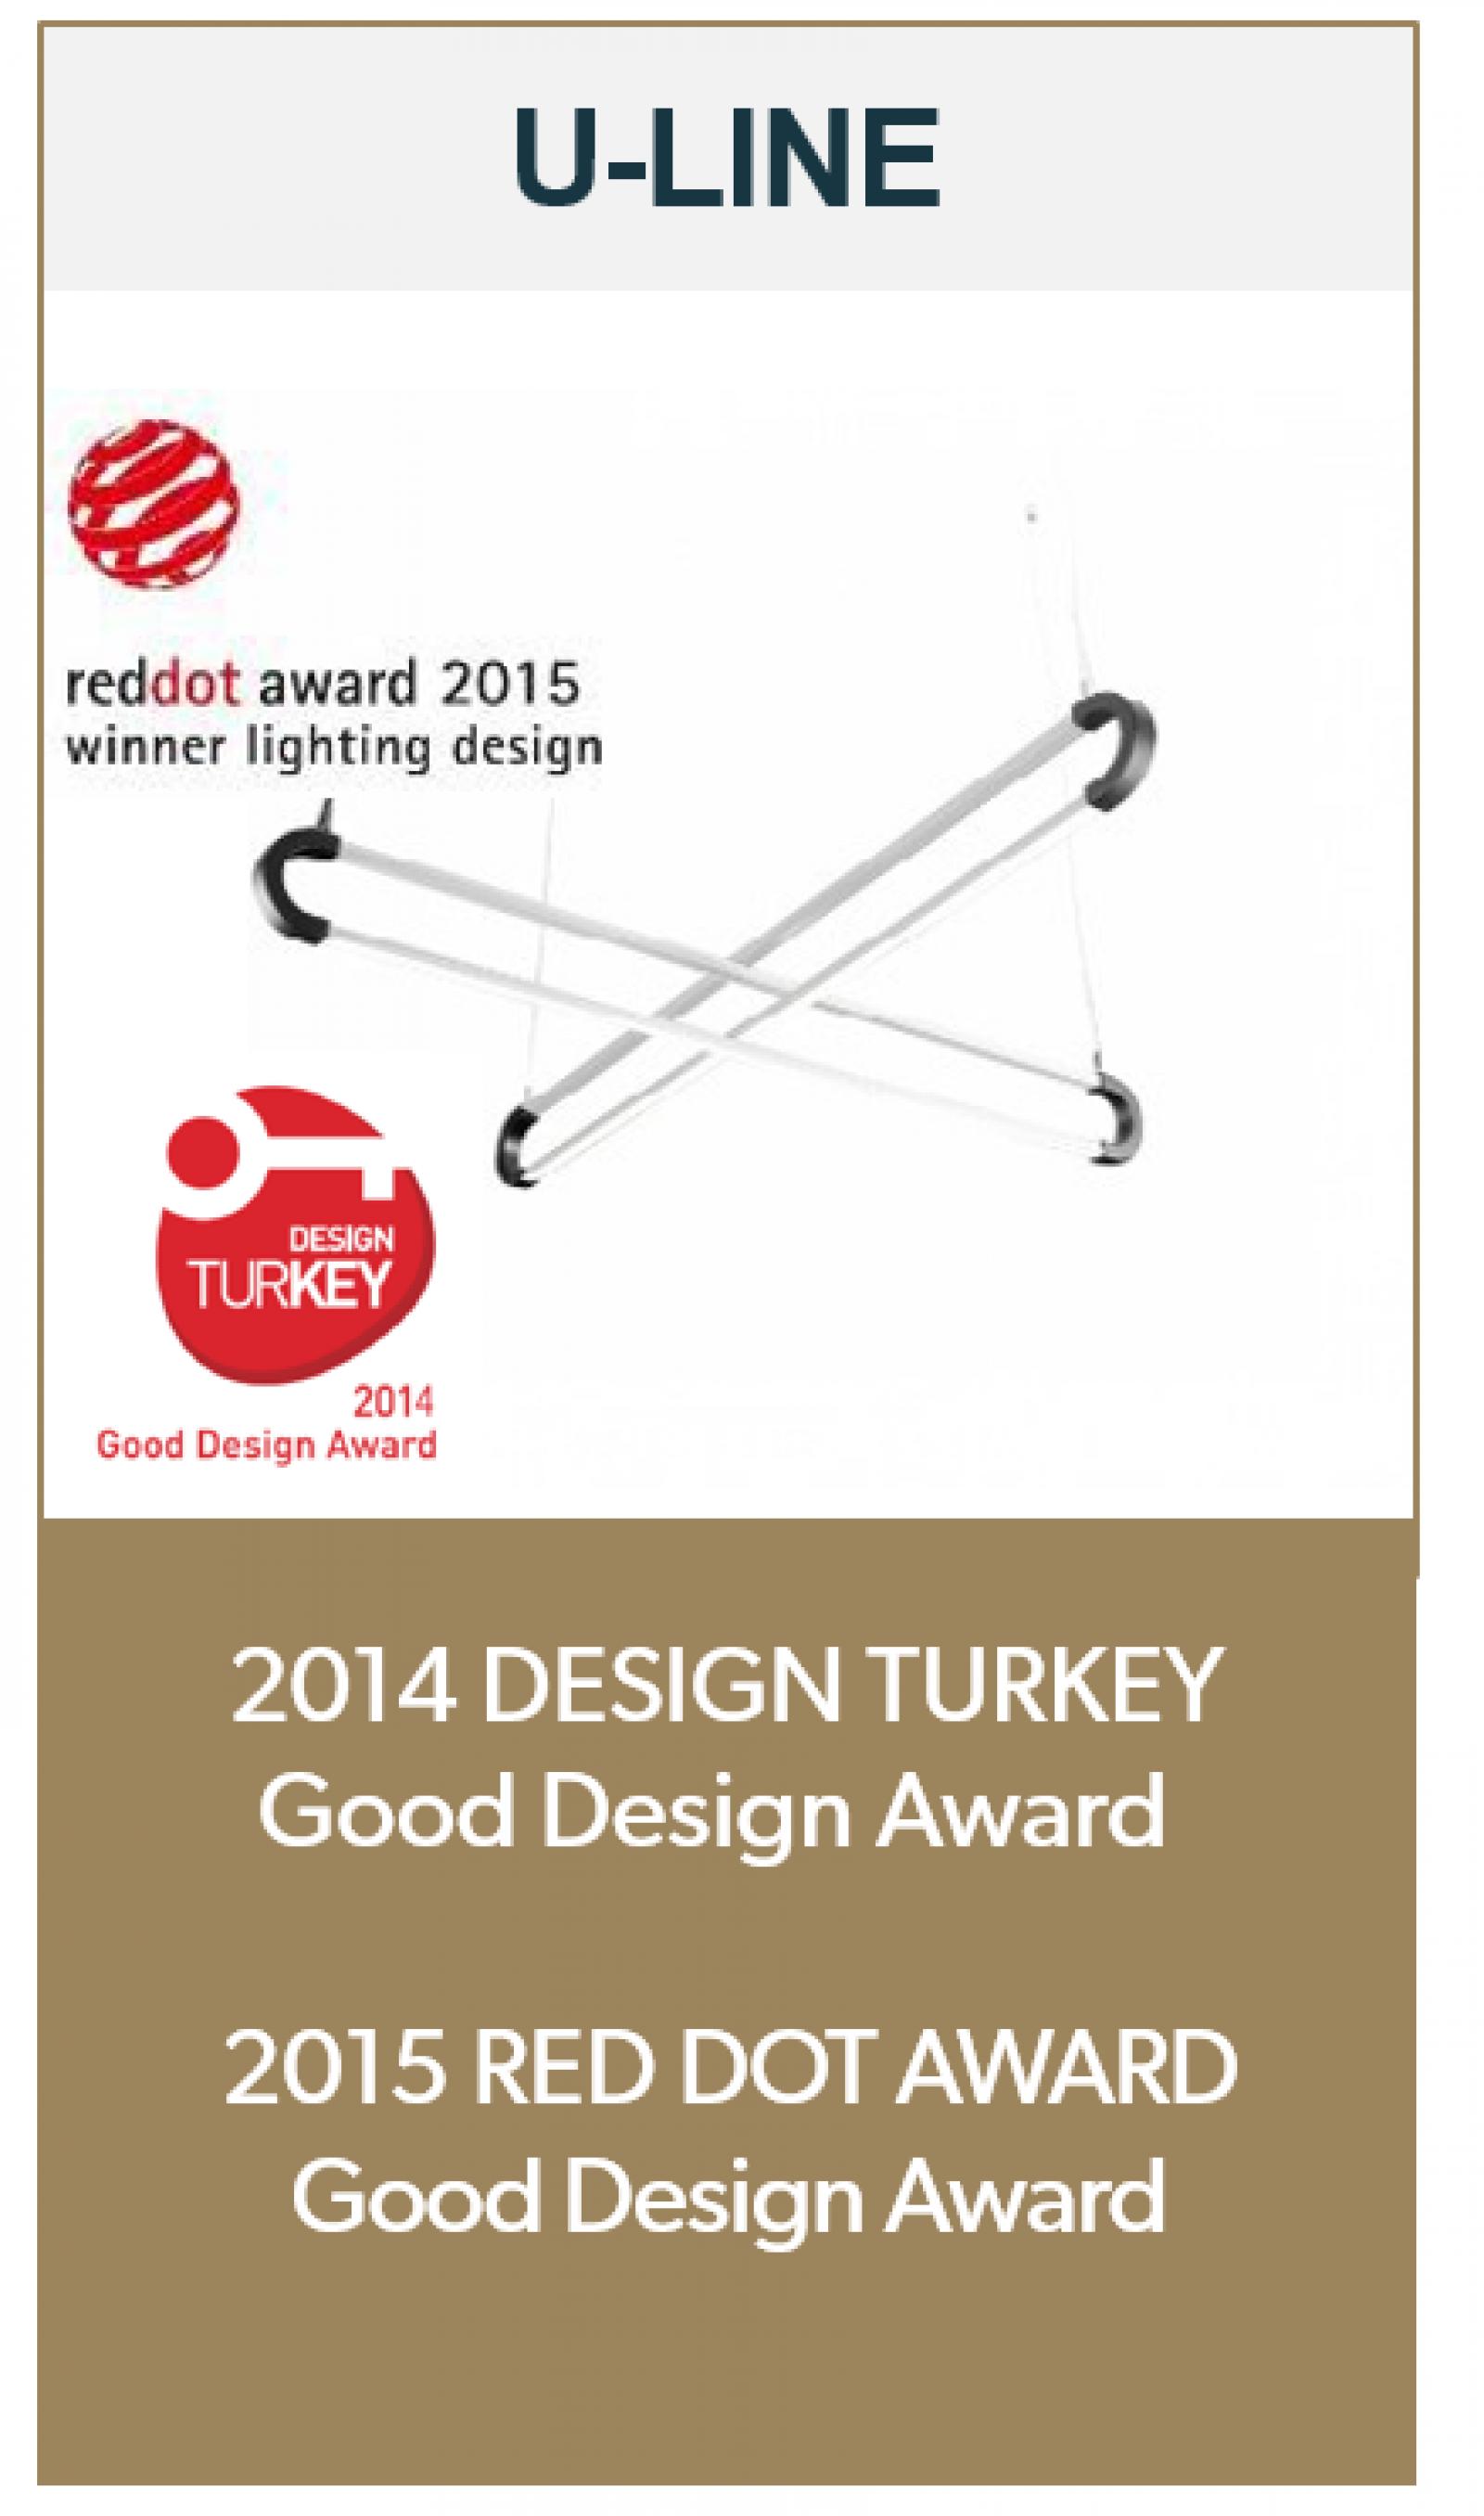 2015 Red Dot Design Award - 2014 Good Design Award